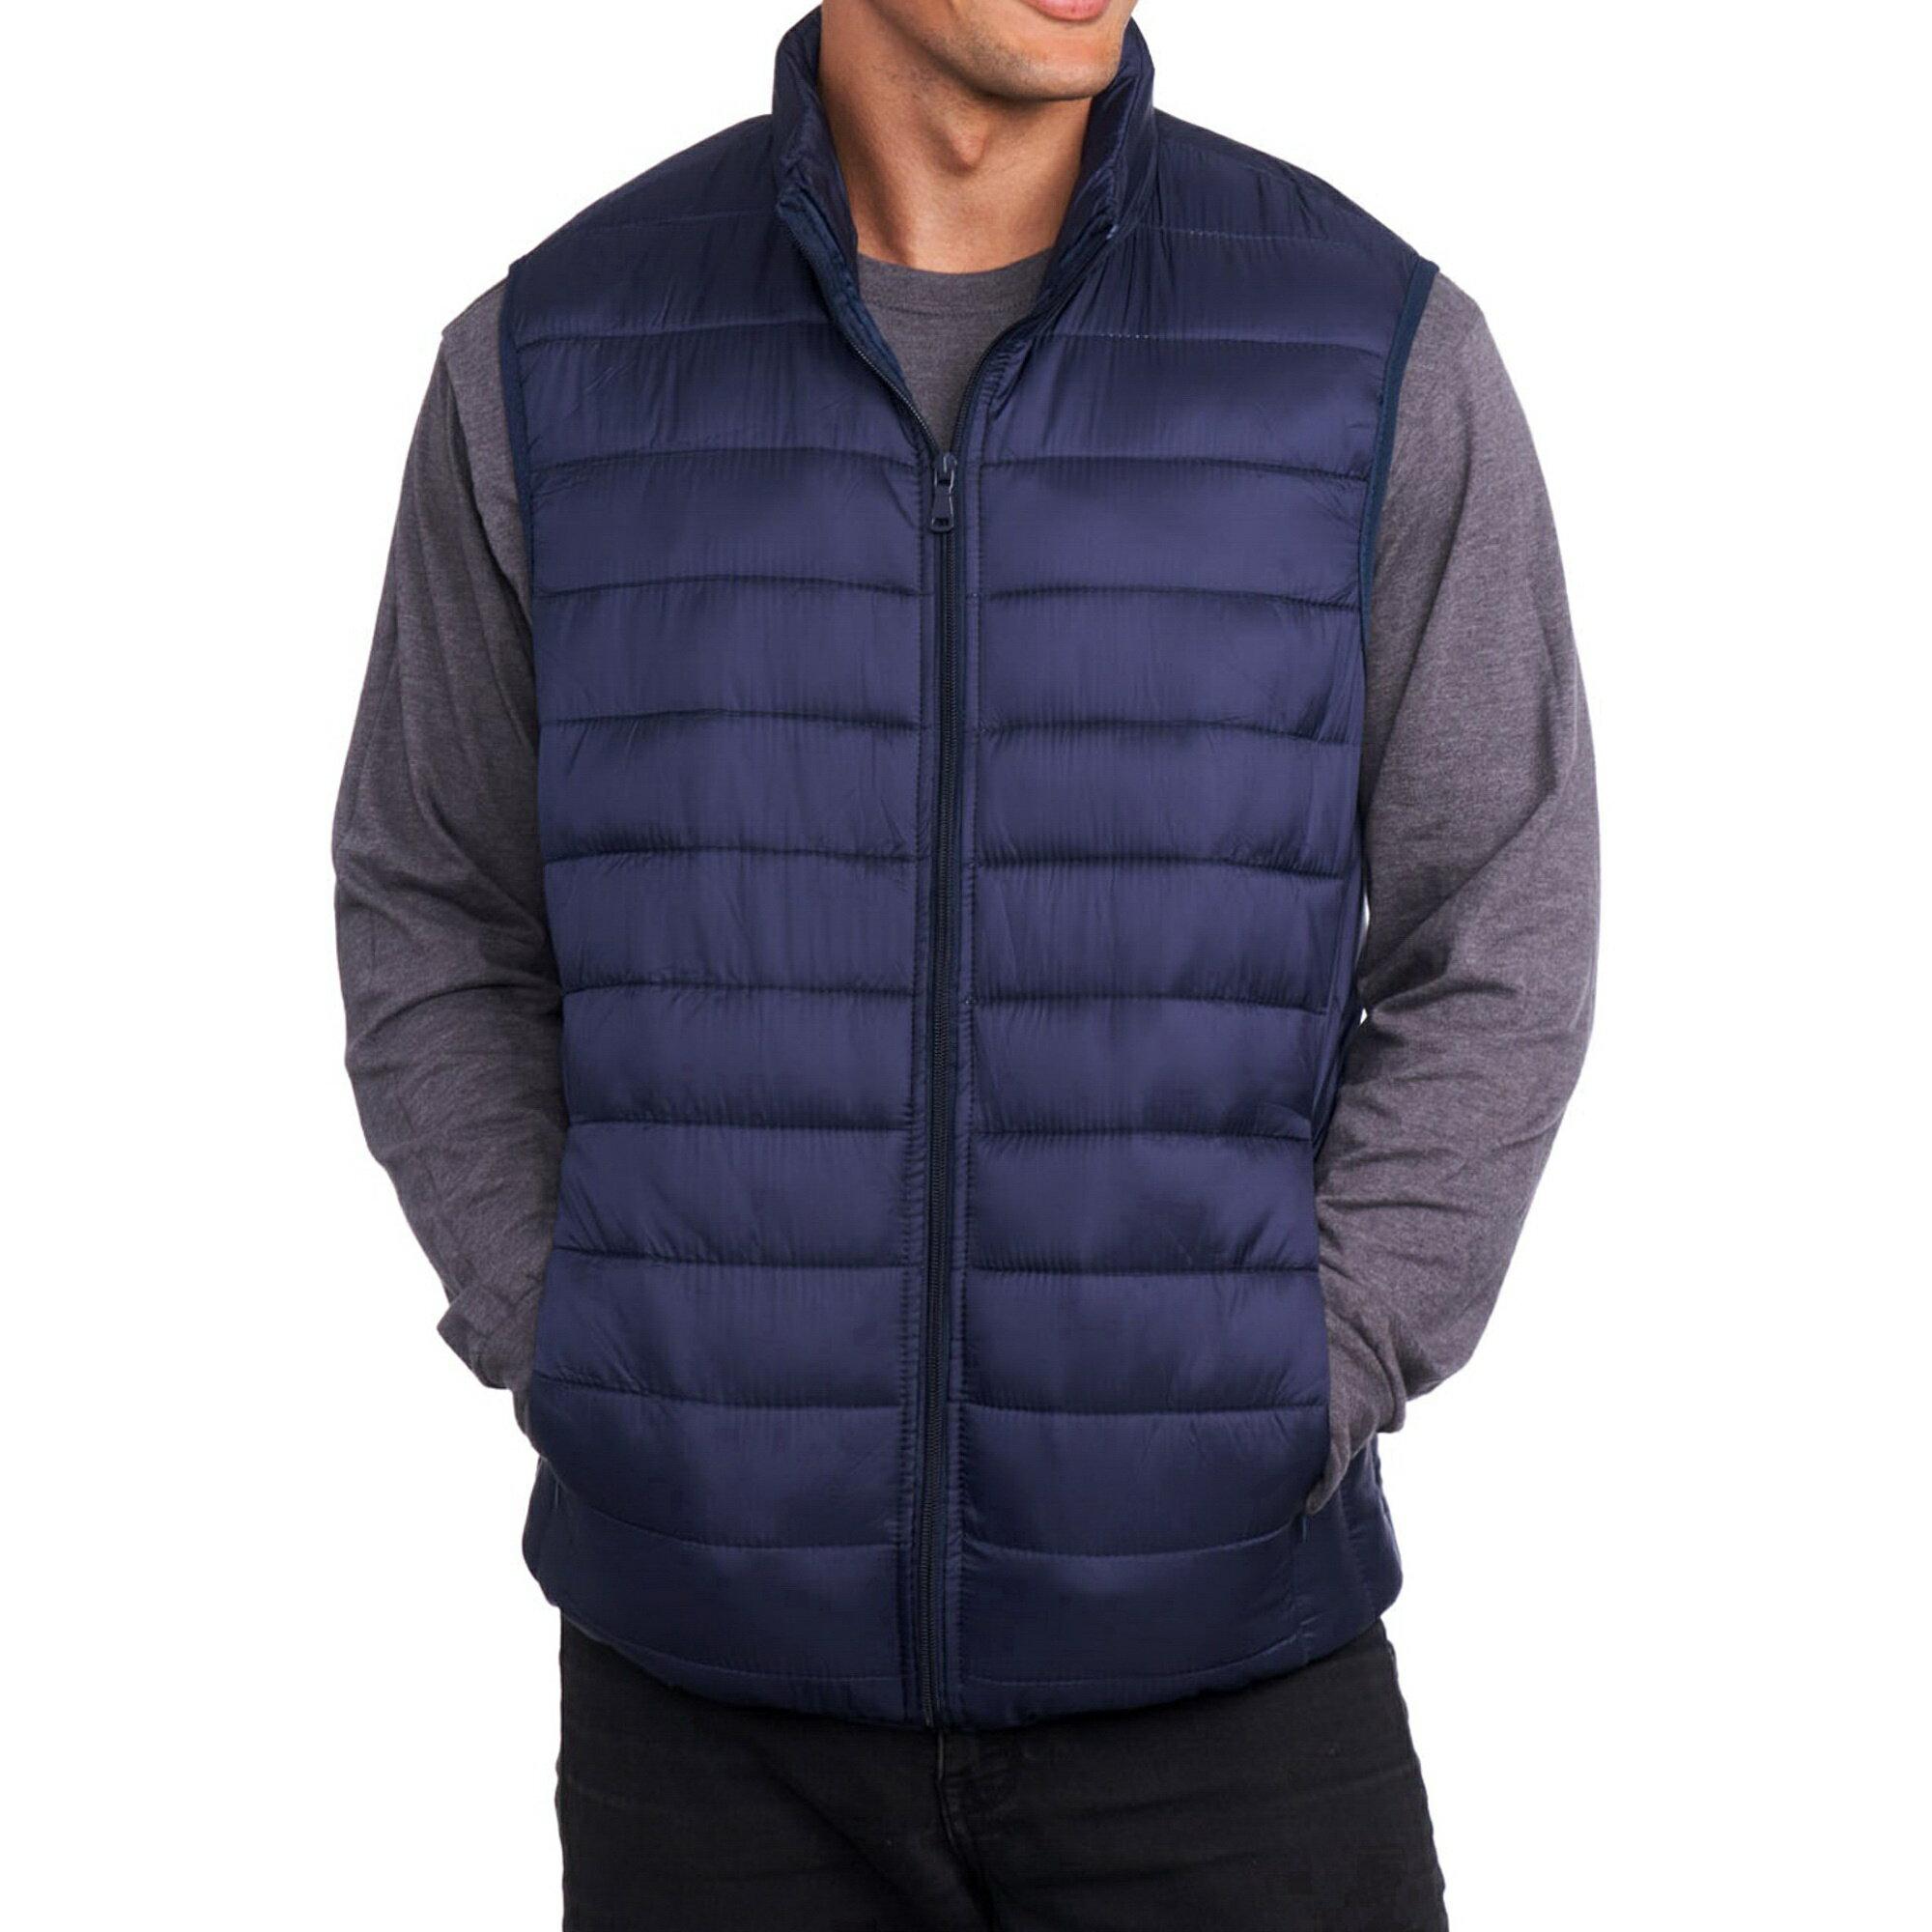 22262459ece Alpine Swiss Mens Down Alternative Vest Jacket Lightweight Packable Puffer  Vest 0